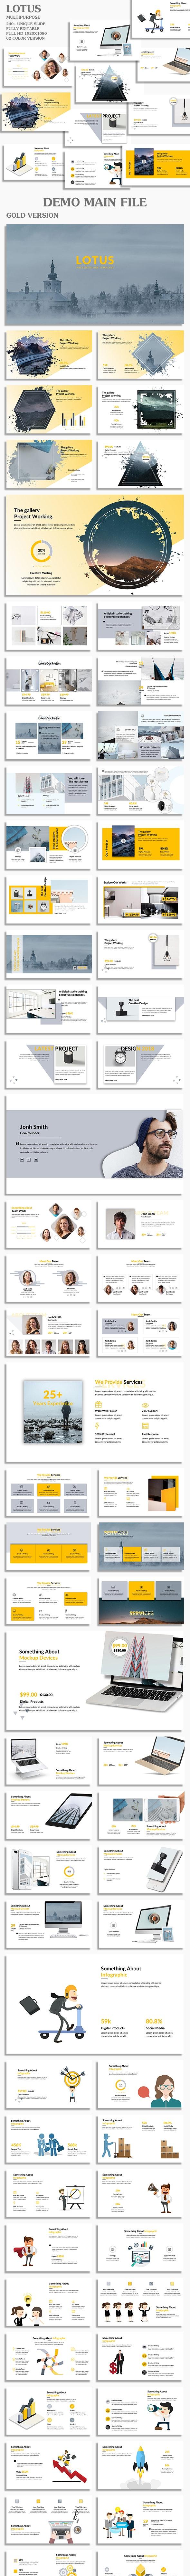 Lotus Multipurpose Google Slide Template - Google Slides Presentation Templates